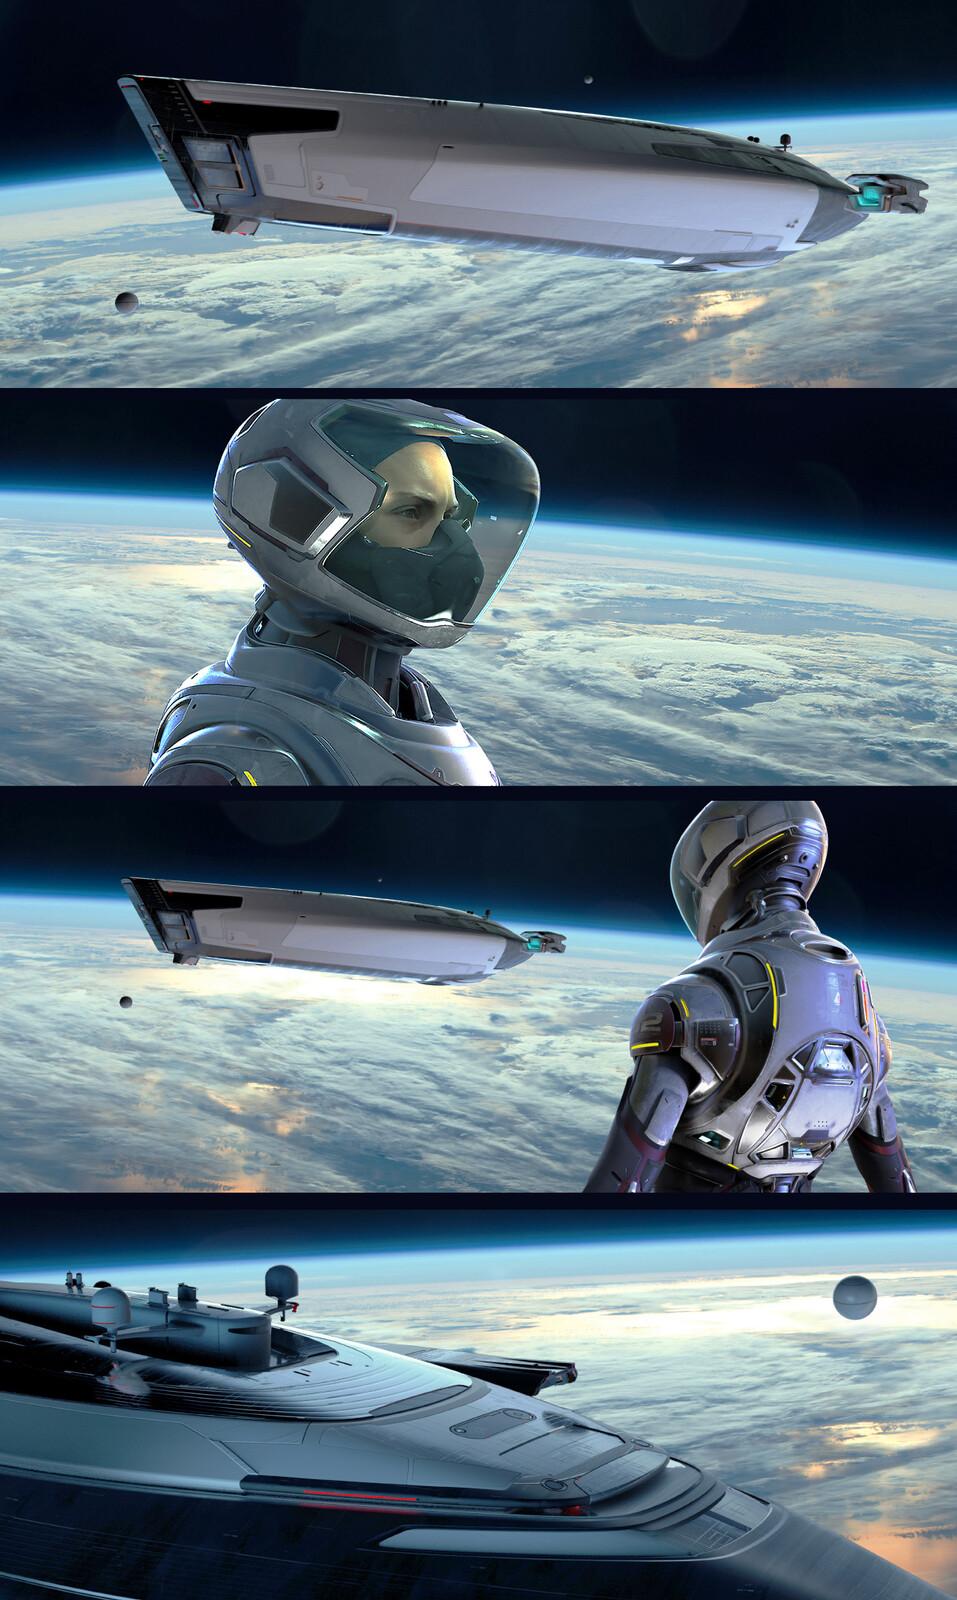 Space mood